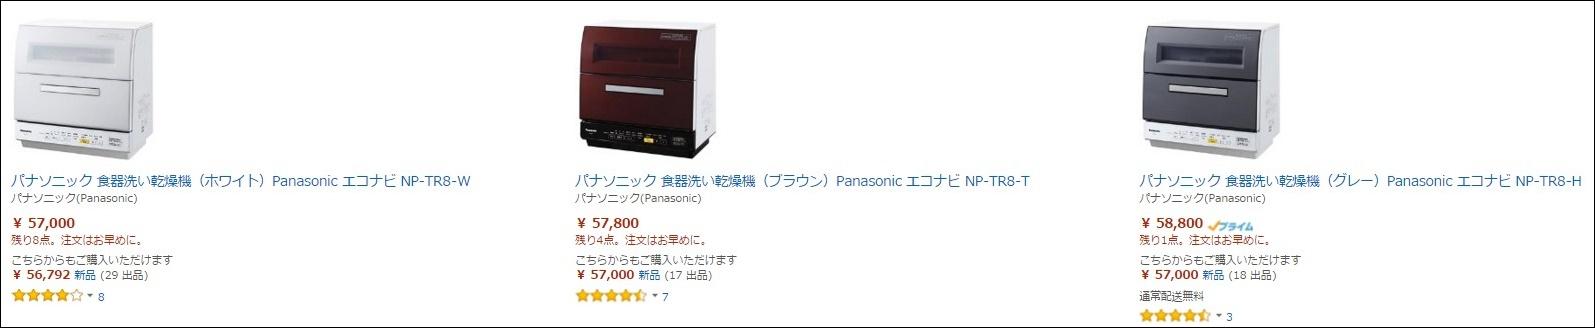 AmazonのNP-TR8-Wのお値段は57000円でした